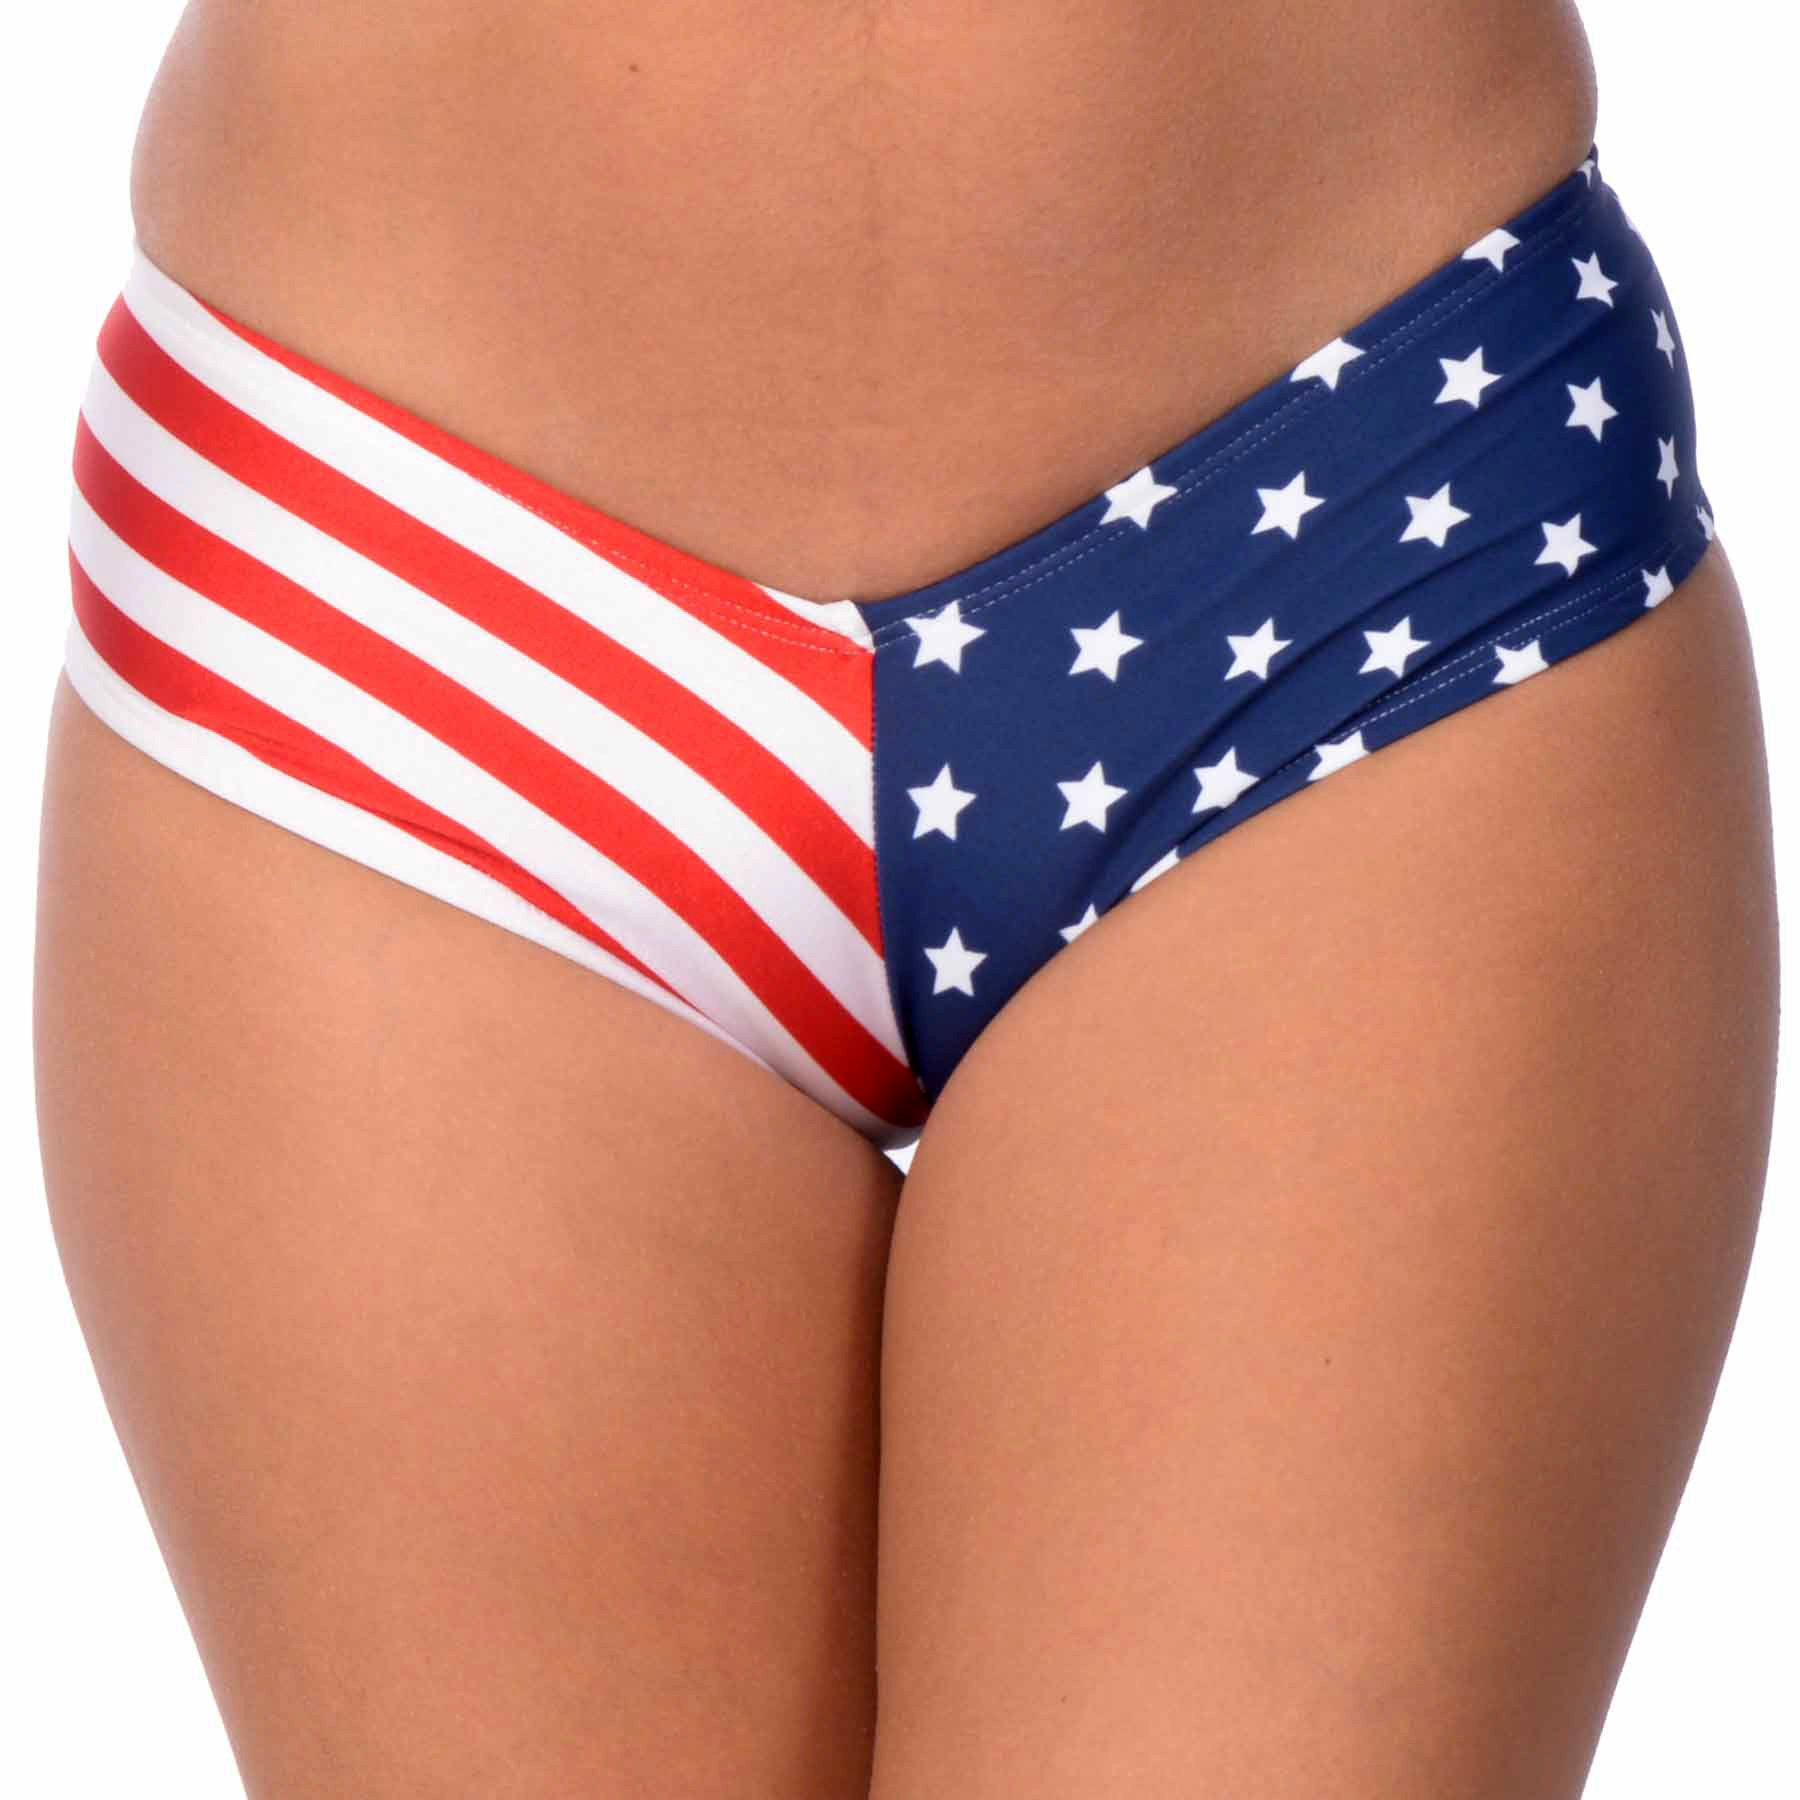 Women's Brazilian V-Style Swimuit USA Stars & Stripes Bikini Bottom (Medium, USA)